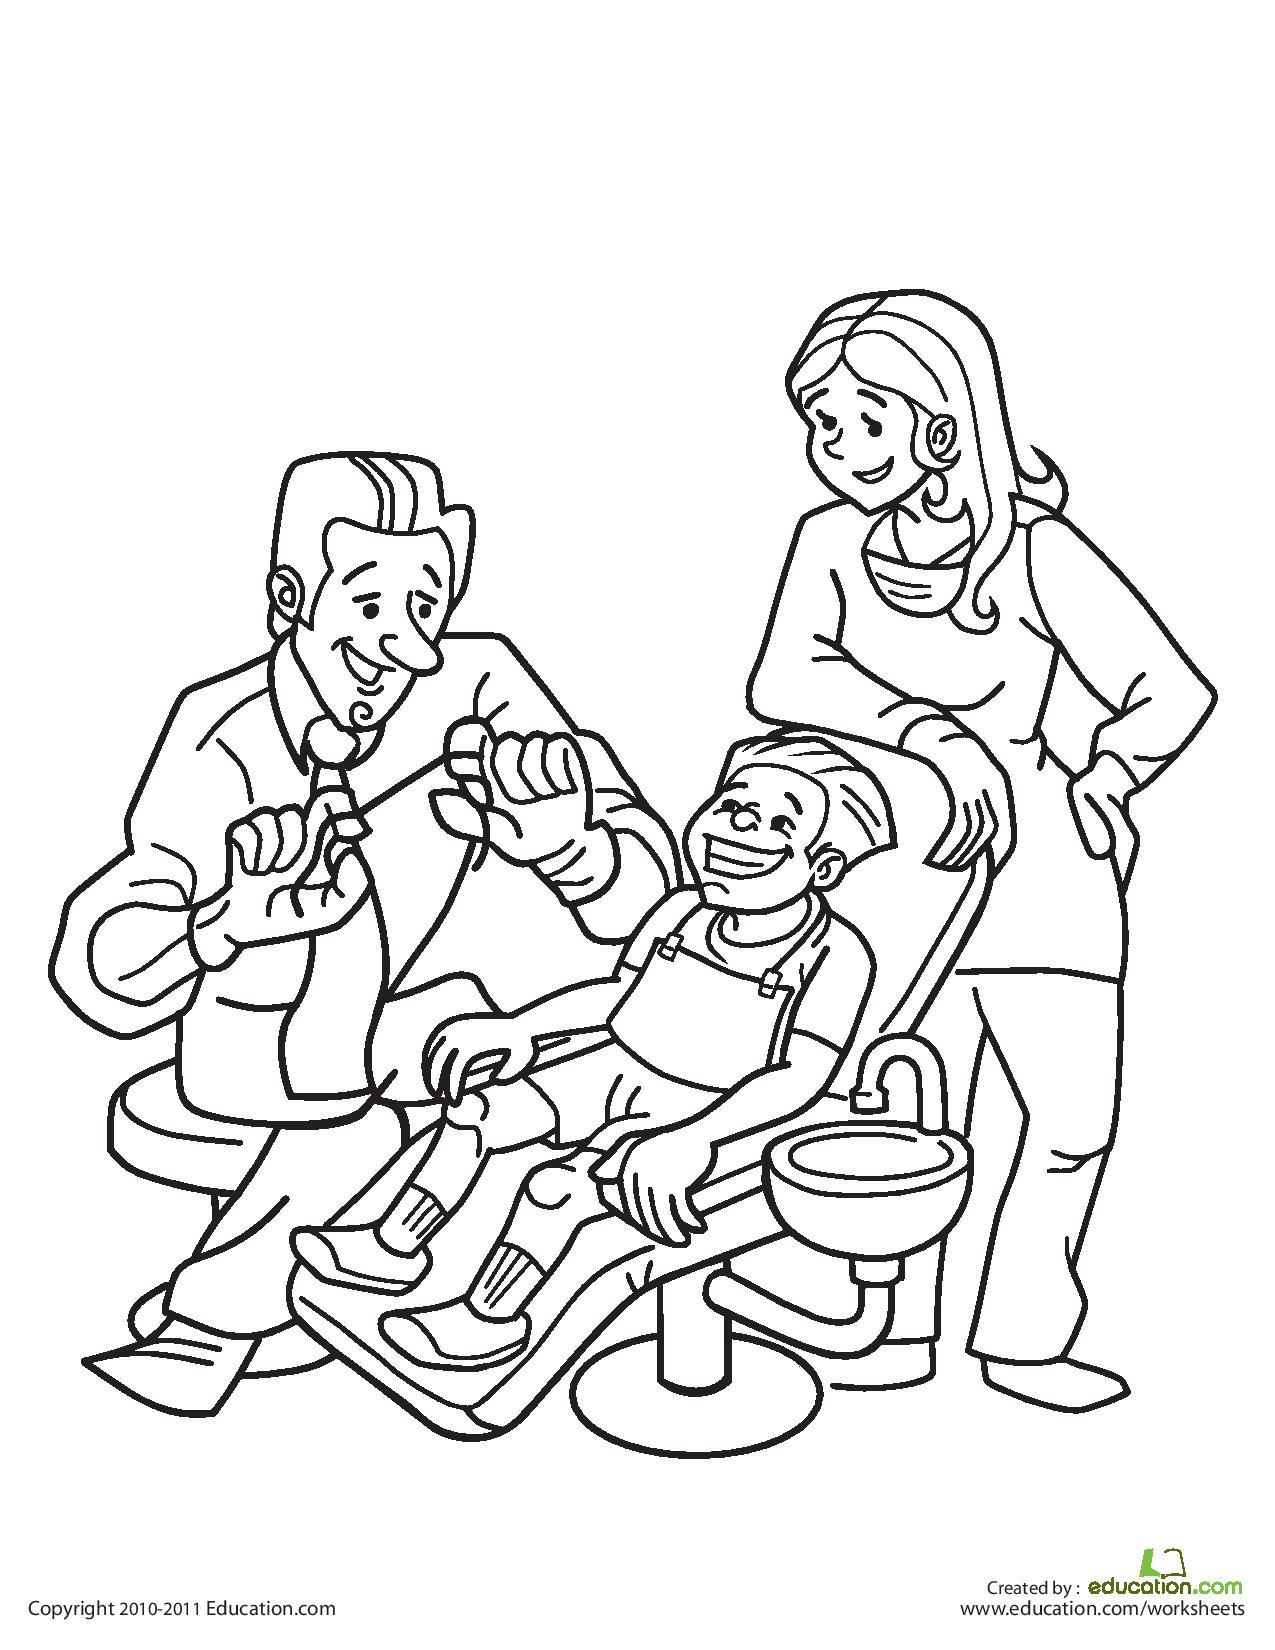 Dental Drawing At Getdrawings